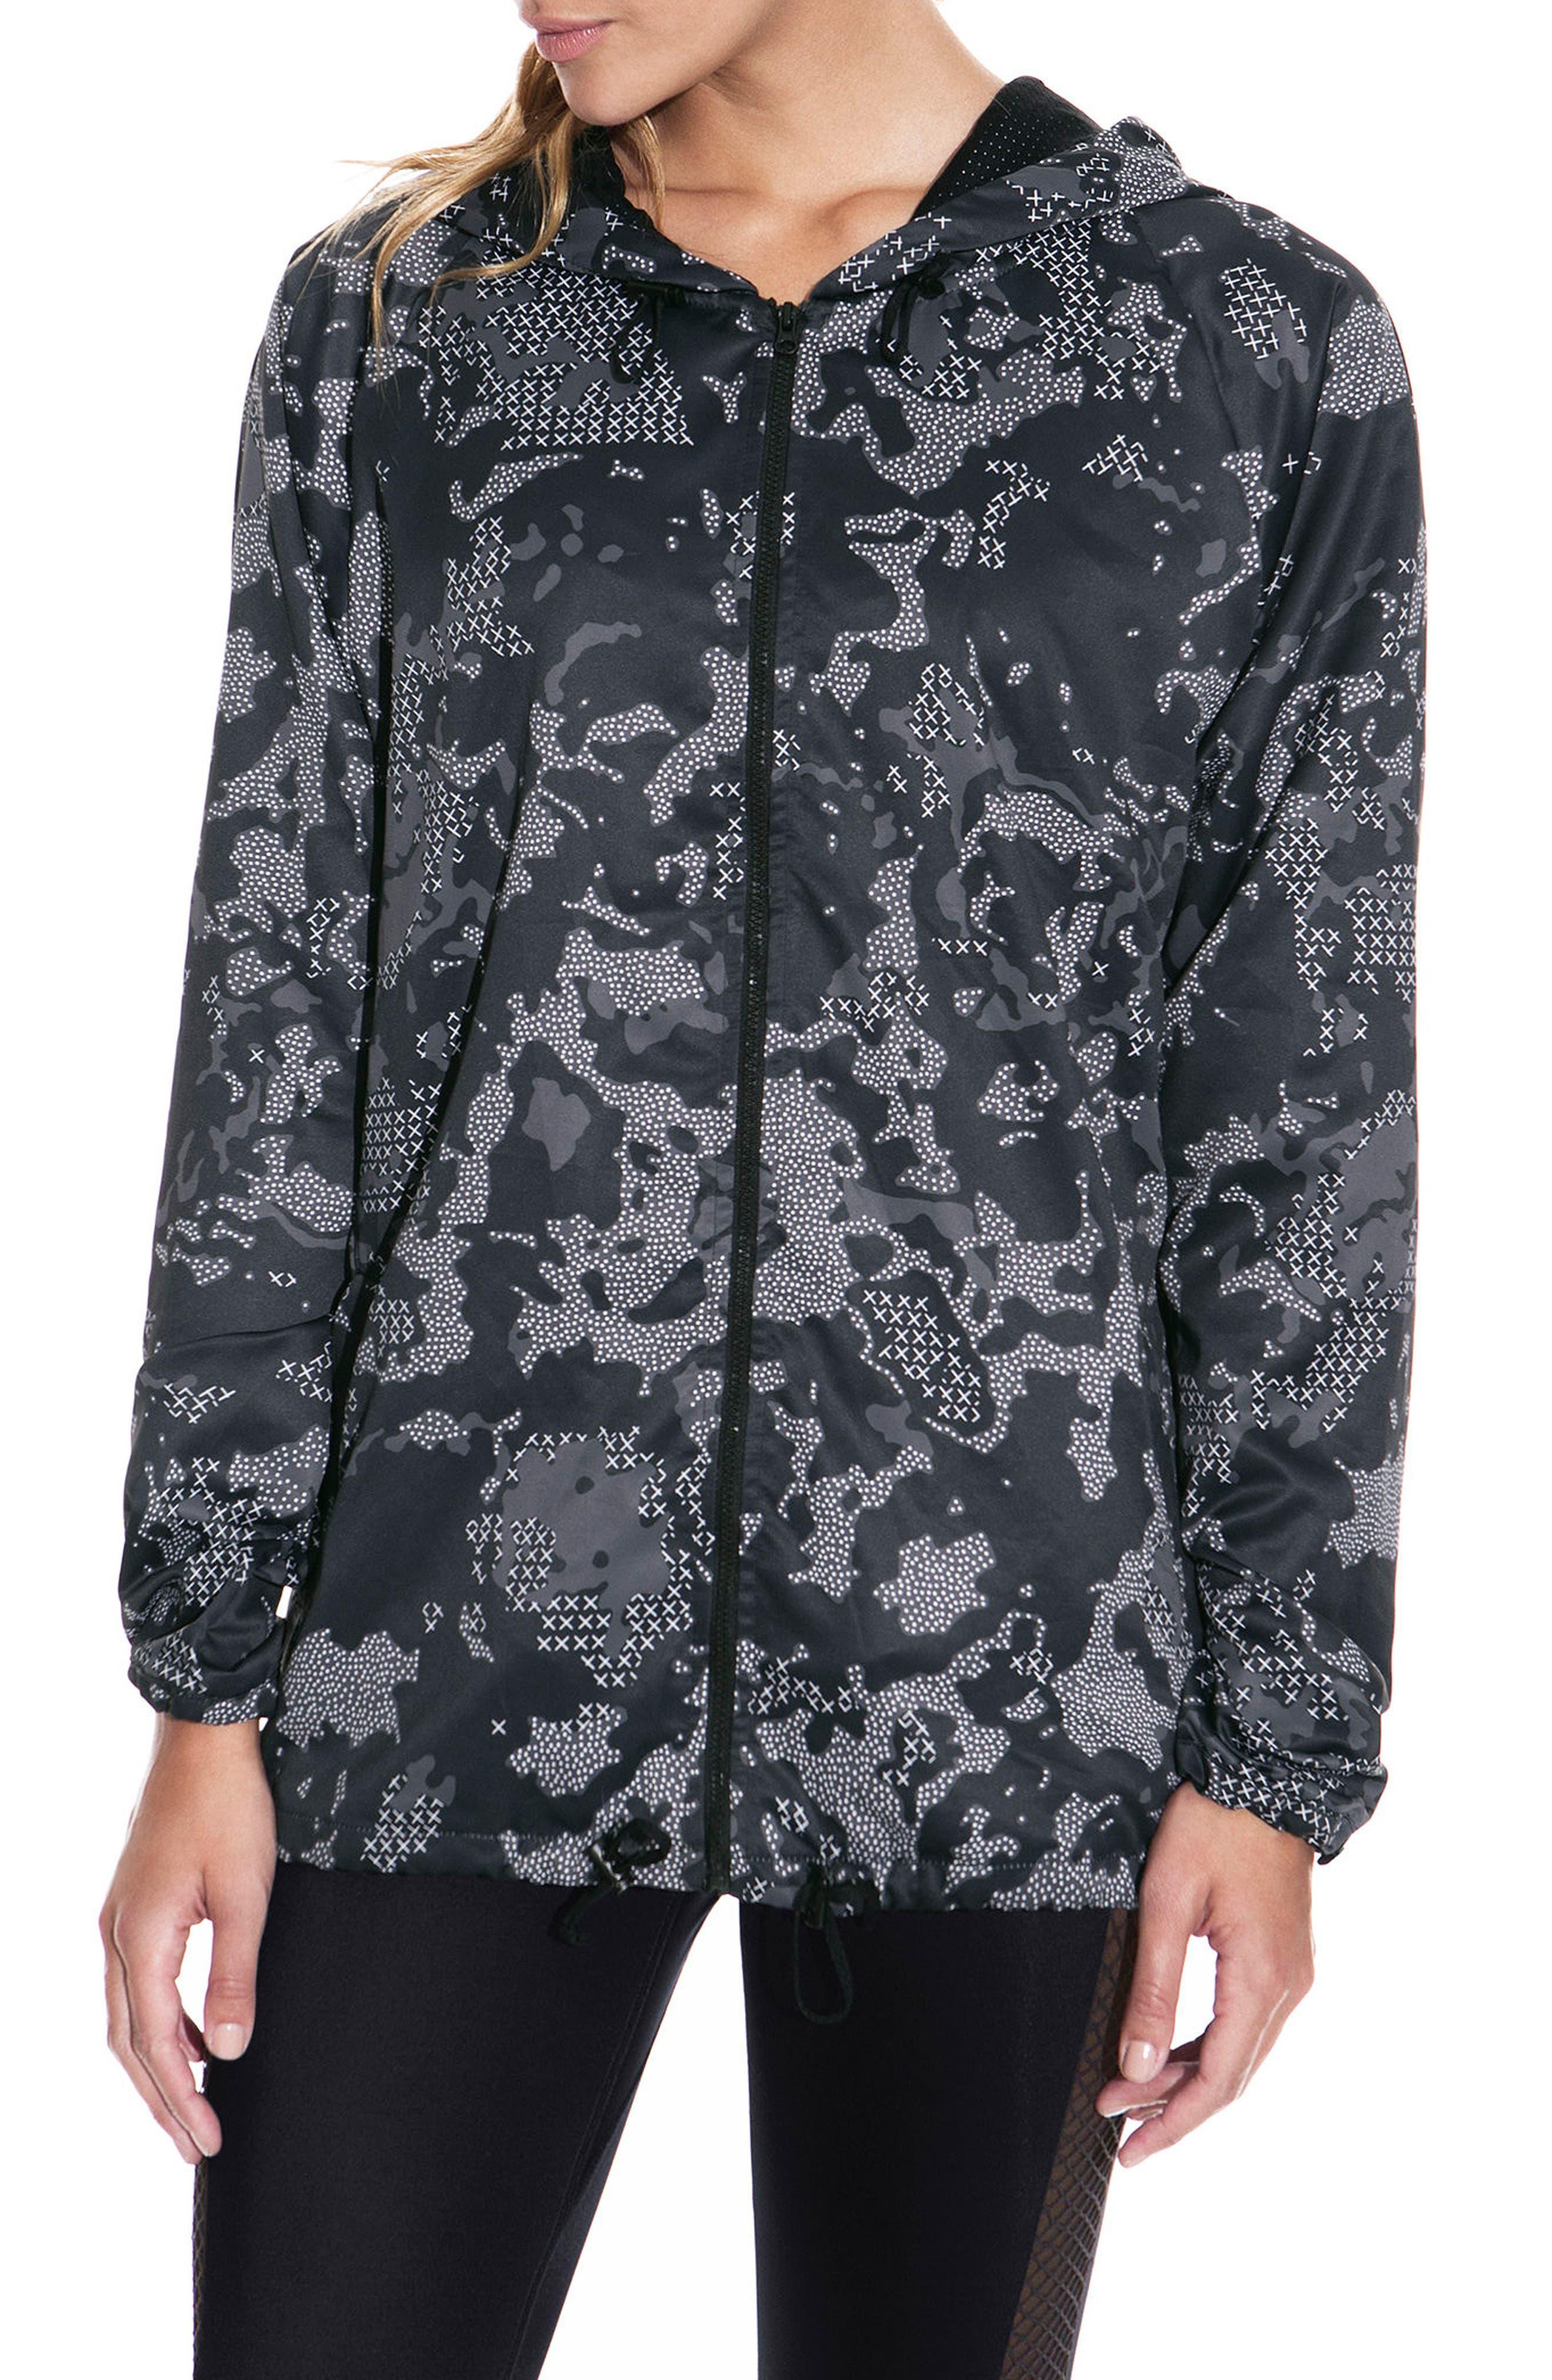 Brisk Black Camo Jacket,                             Main thumbnail 1, color,                             001